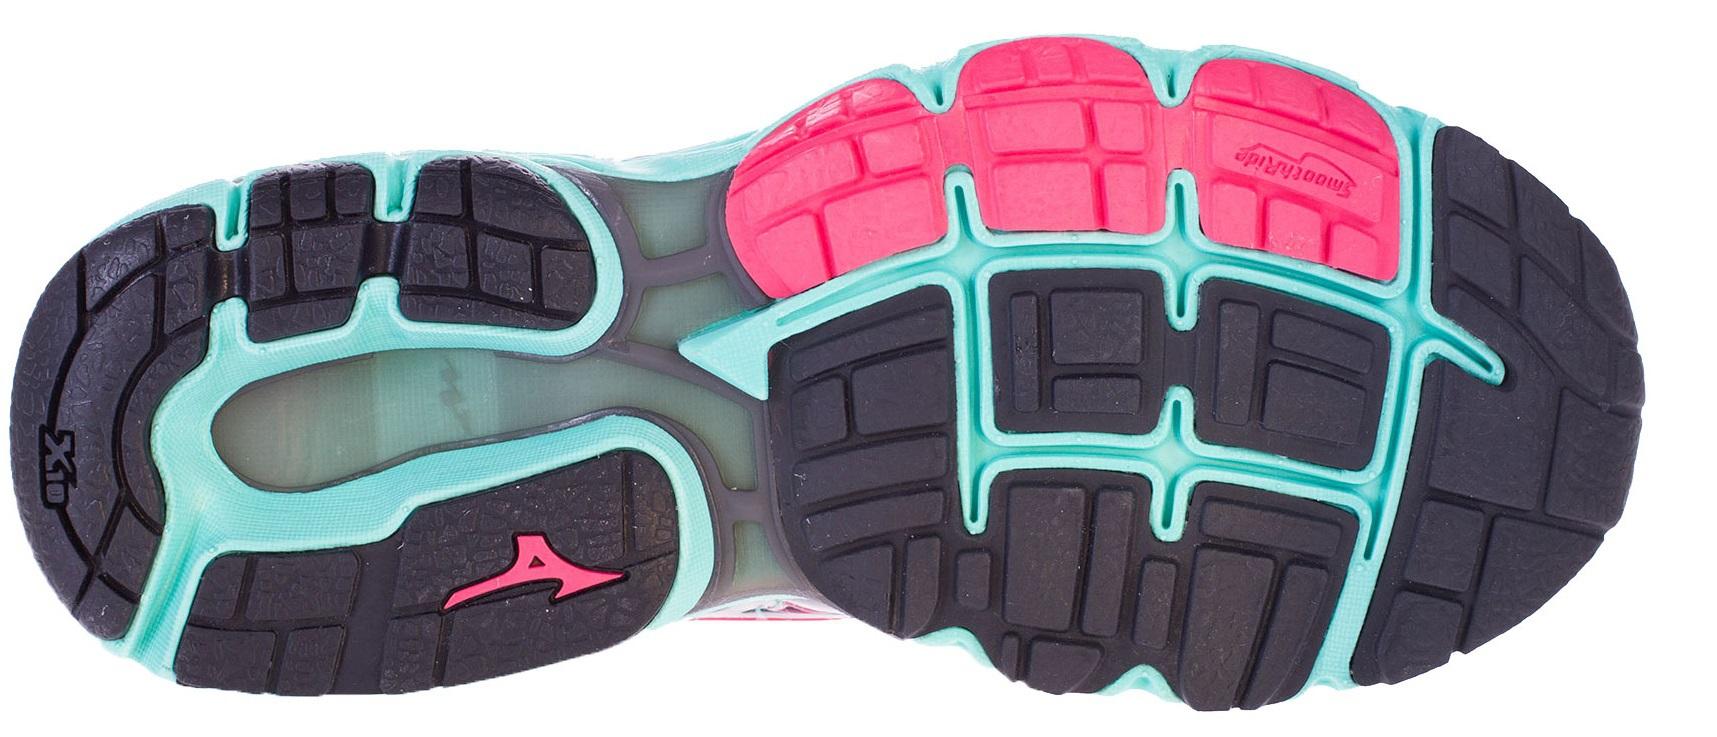 Mizuno Wave Inspire 11 Кроссовки для бега женские